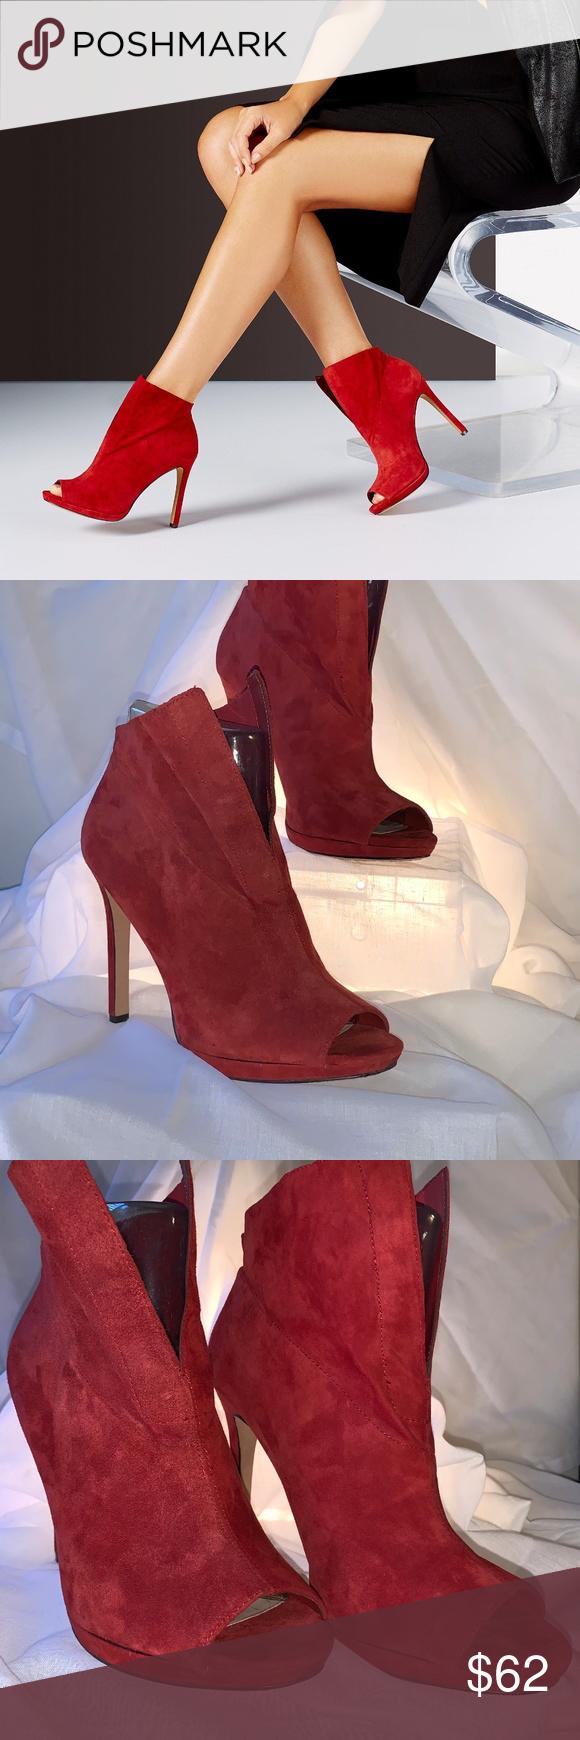 583443d65731 Vince Camuto Red Suede Bootie Shootie - SZ 10 M Sexy Valentine Shoe Bootie